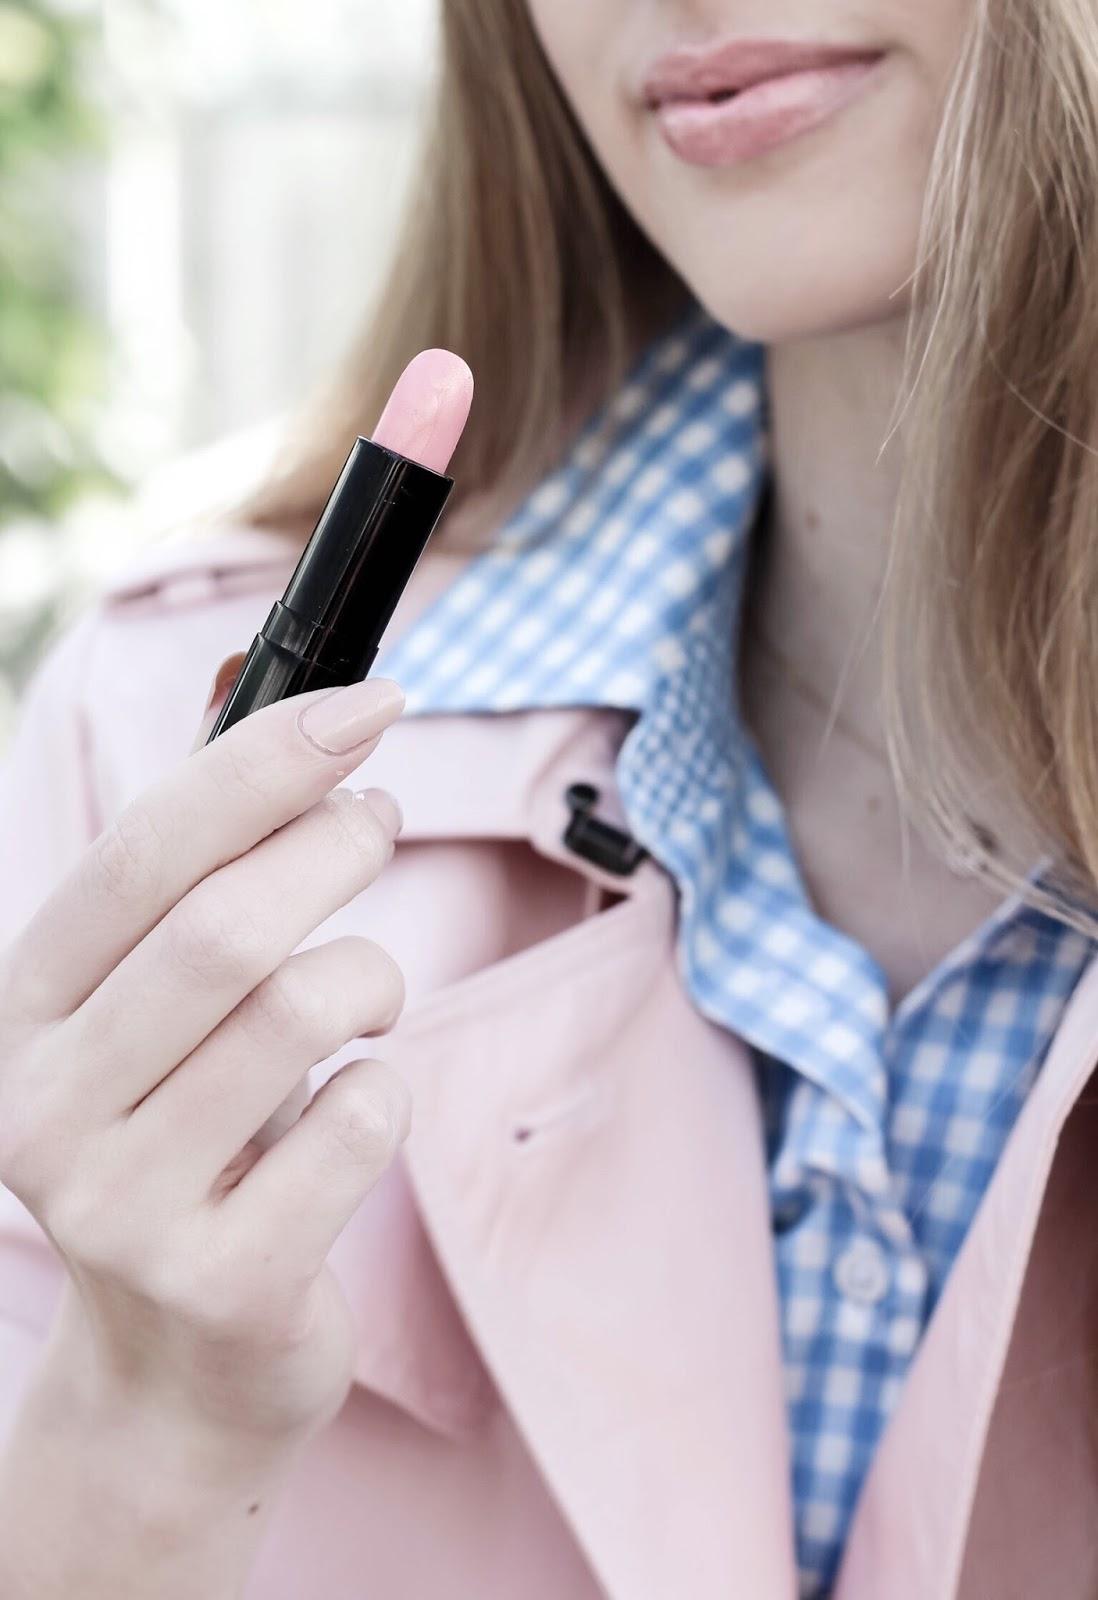 Mii Cosmetics Passionate Lip Lover Lipstick Enthral